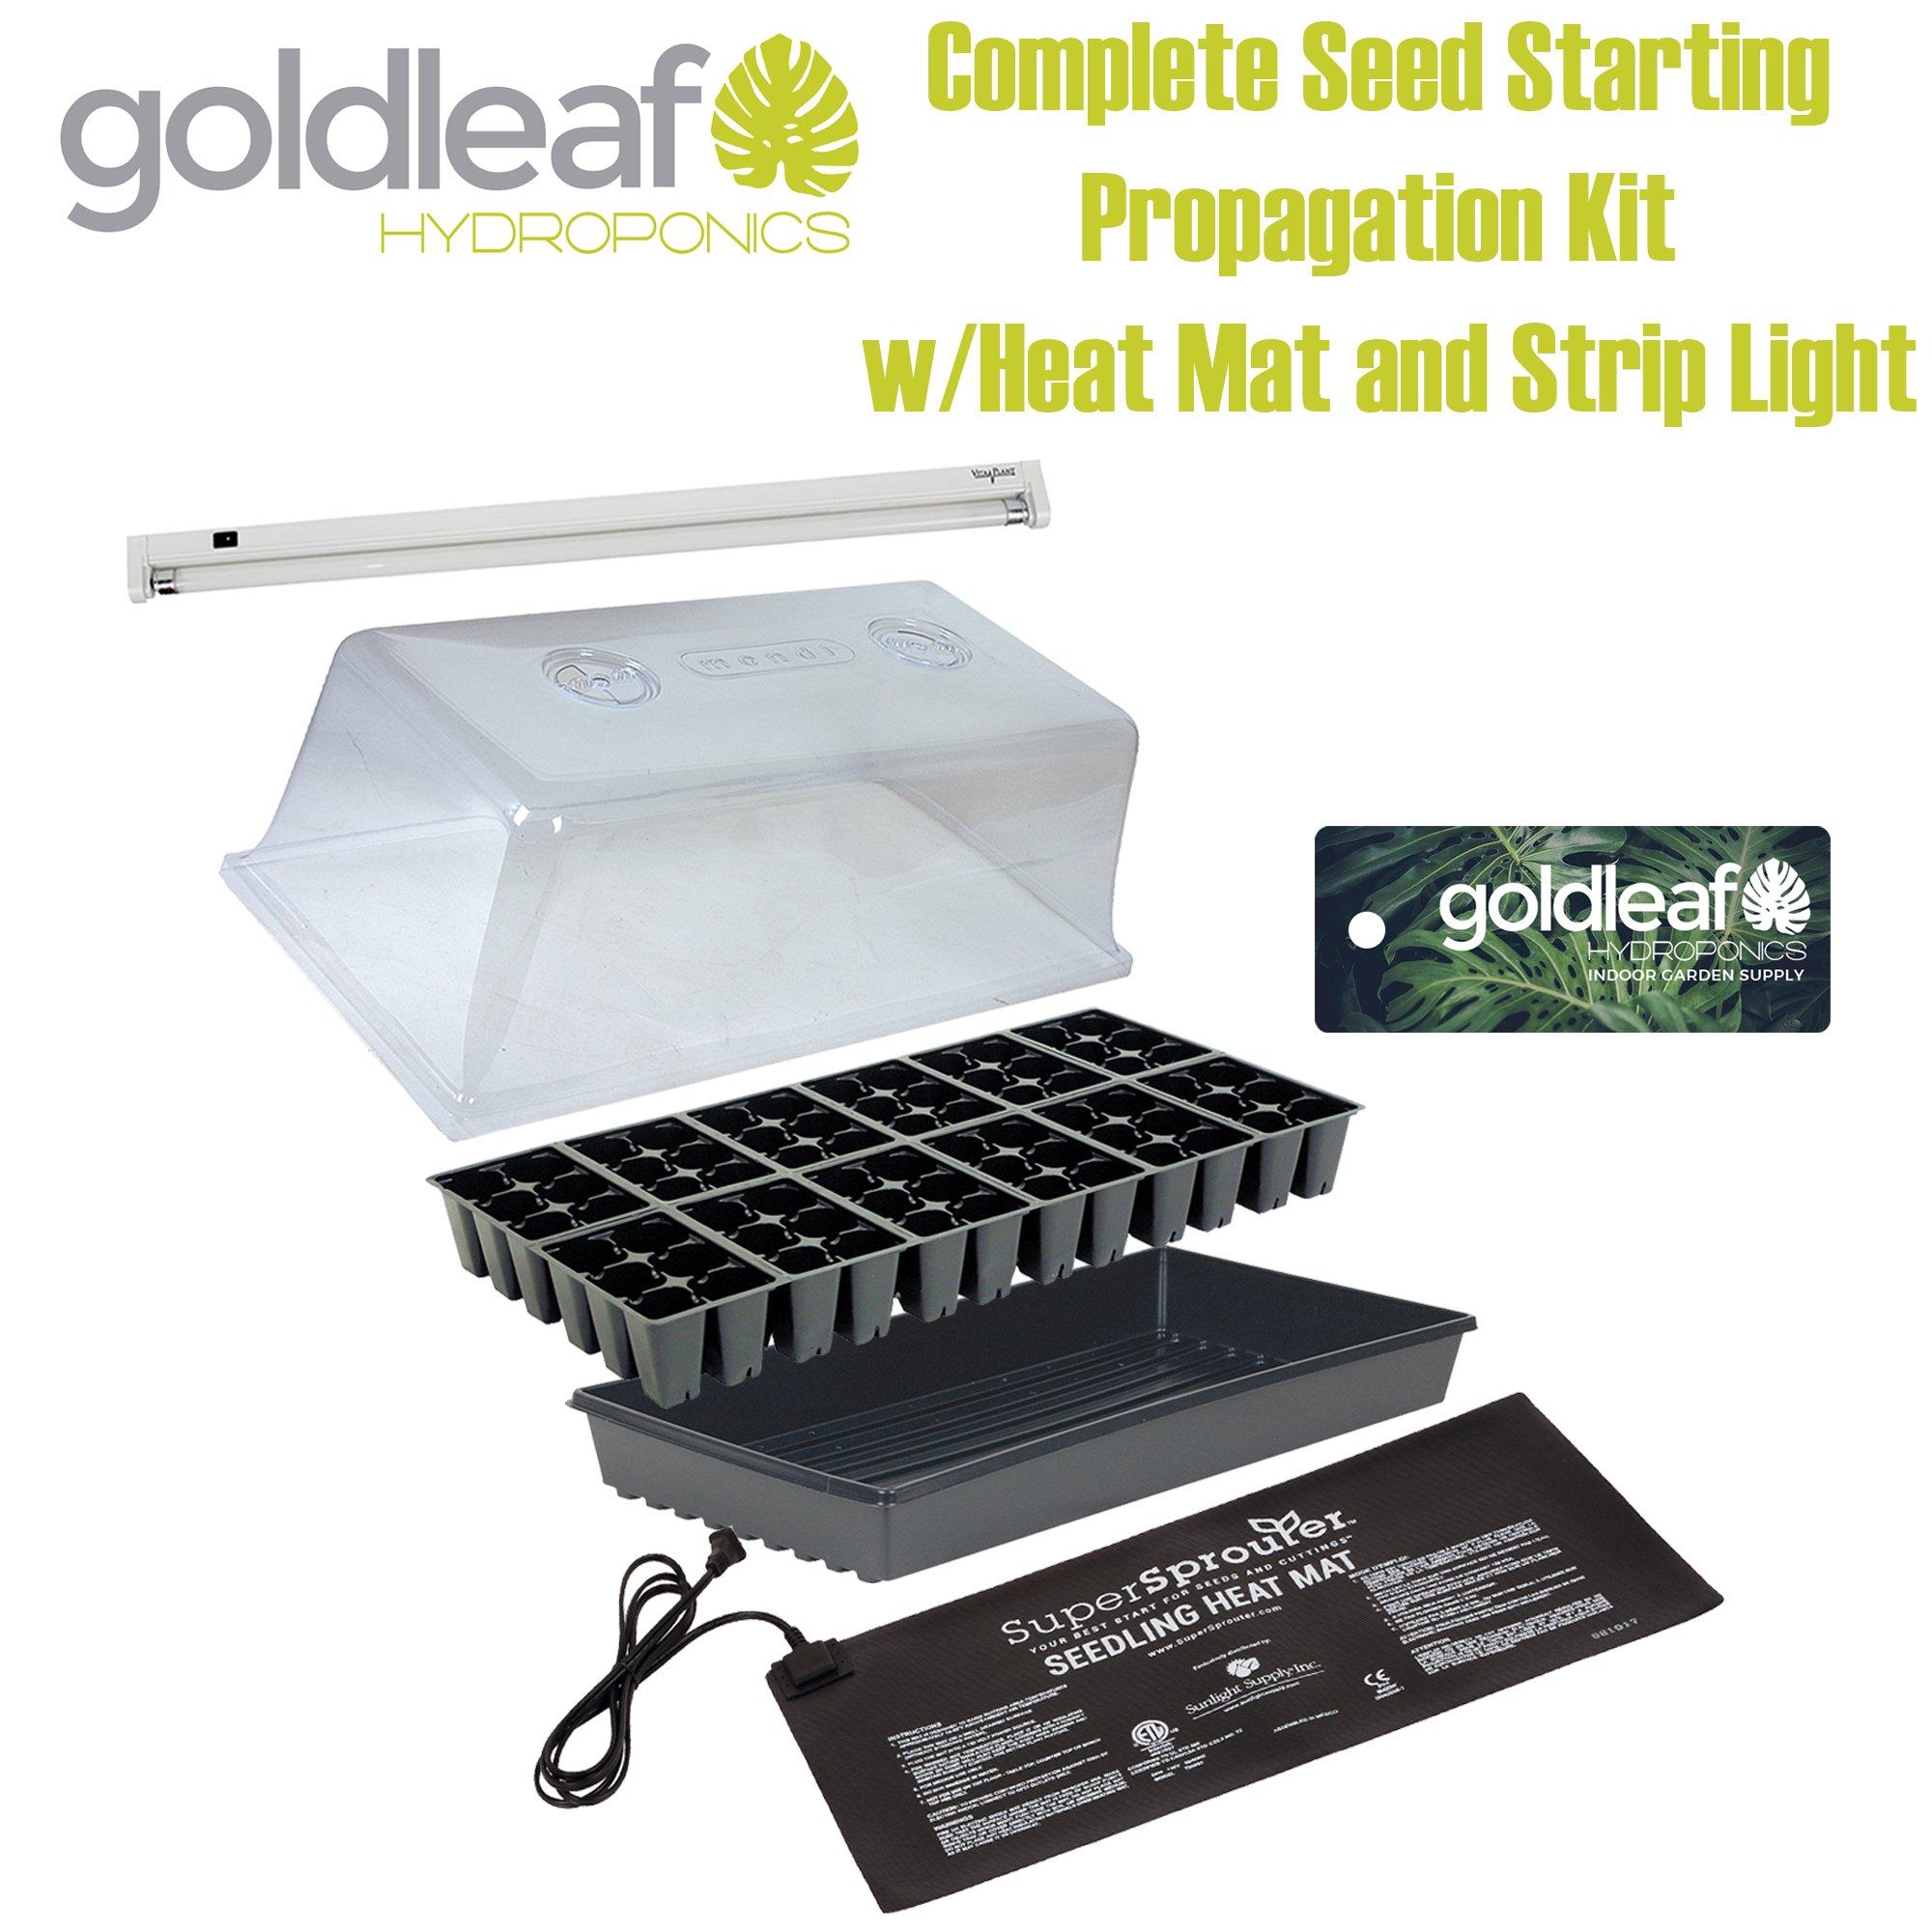 Complete Seed Starting Propagation Kit w/ Heat Mat, T5 Light, Humidity dome +